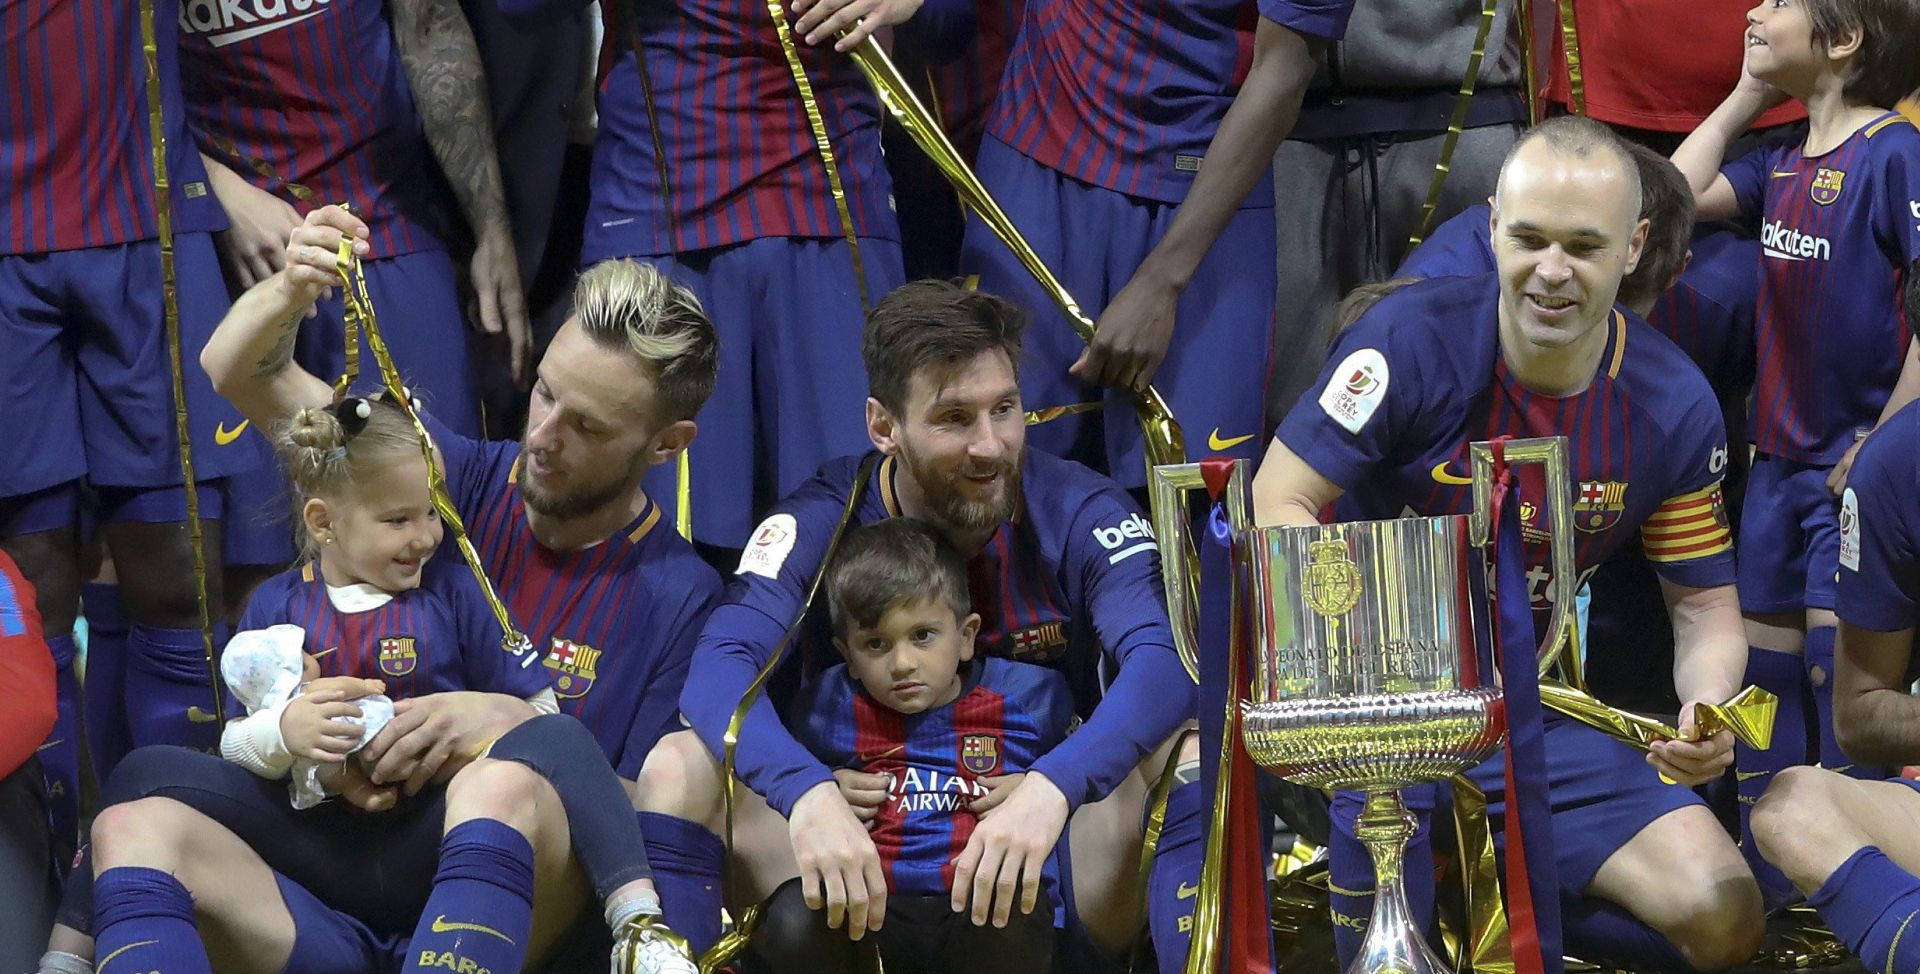 Barcelona do 2021. očekuje milijardu eura prihoda